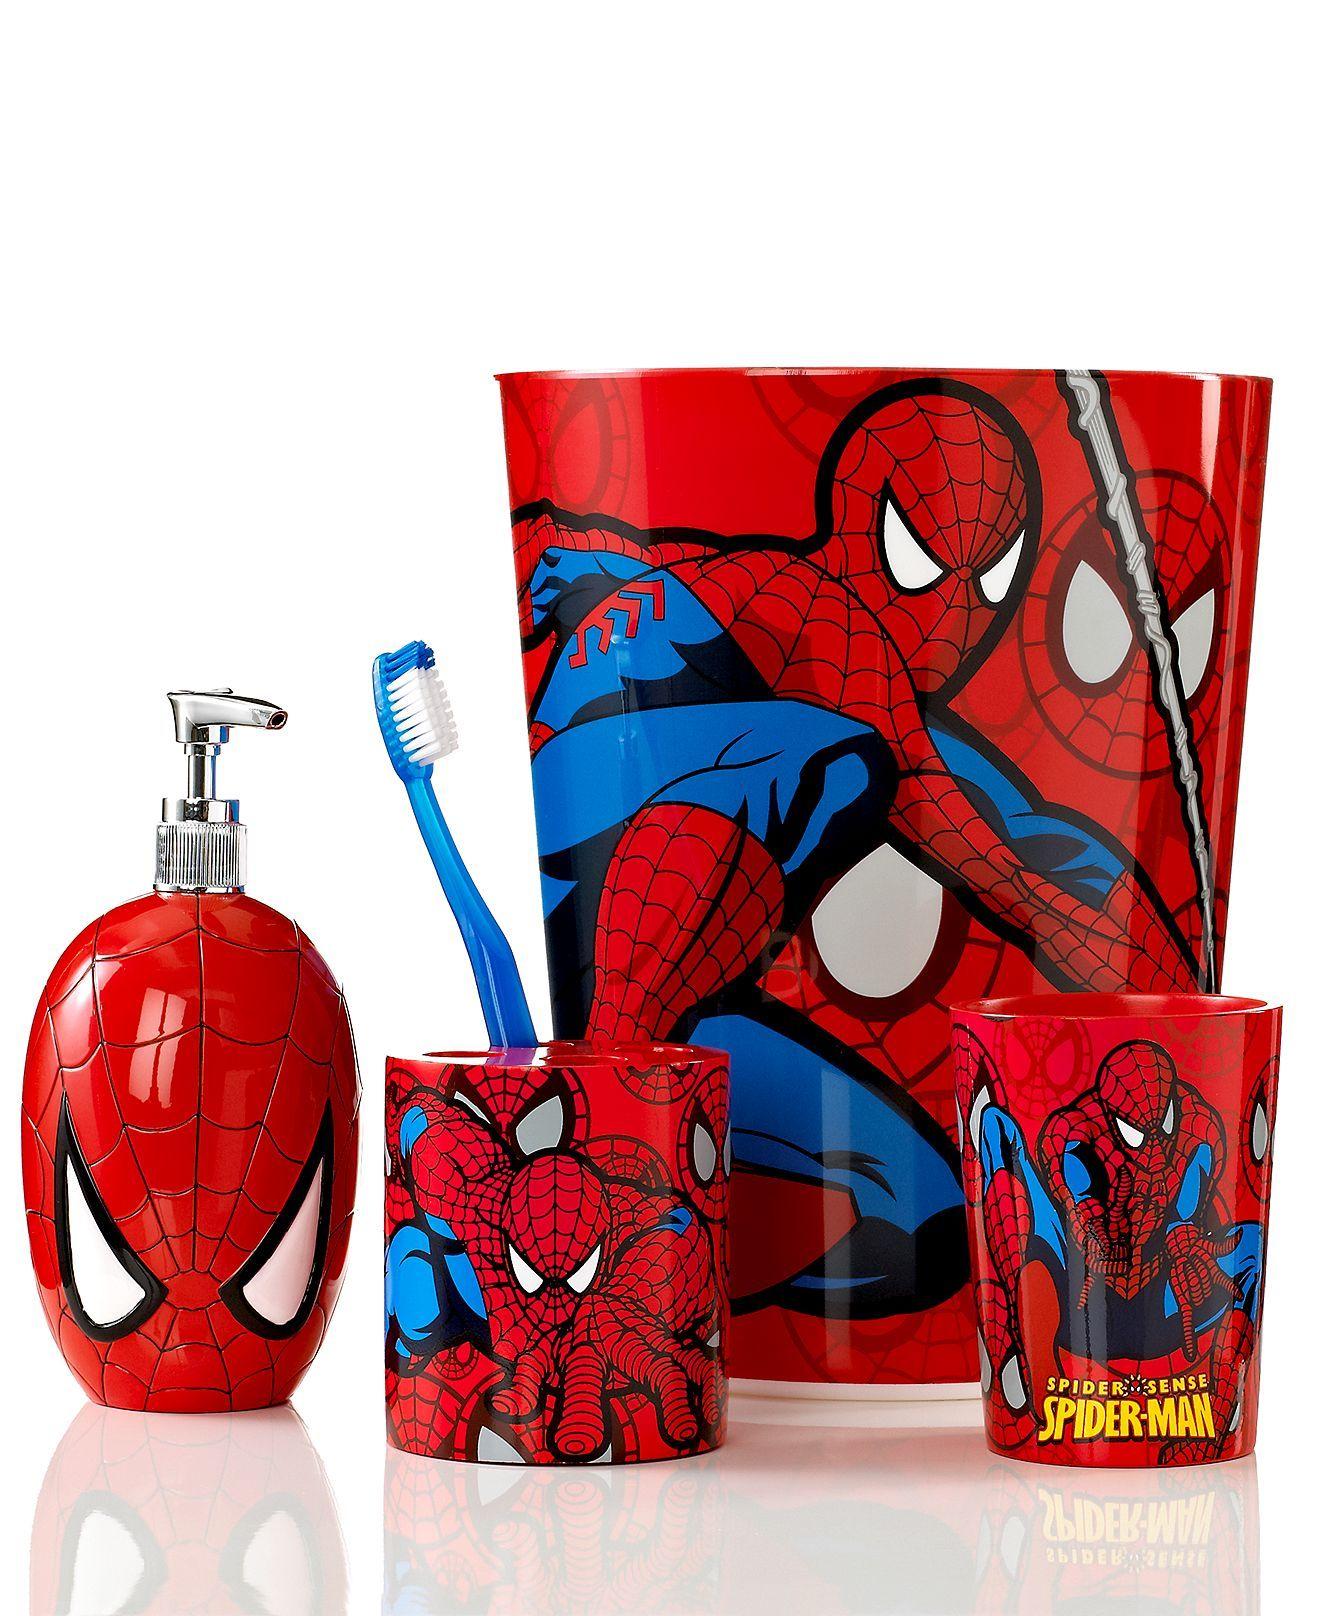 Marvel Bath Accessories Spider Man Sense Collection Marvel Gifts Amp More Pinterest Bath